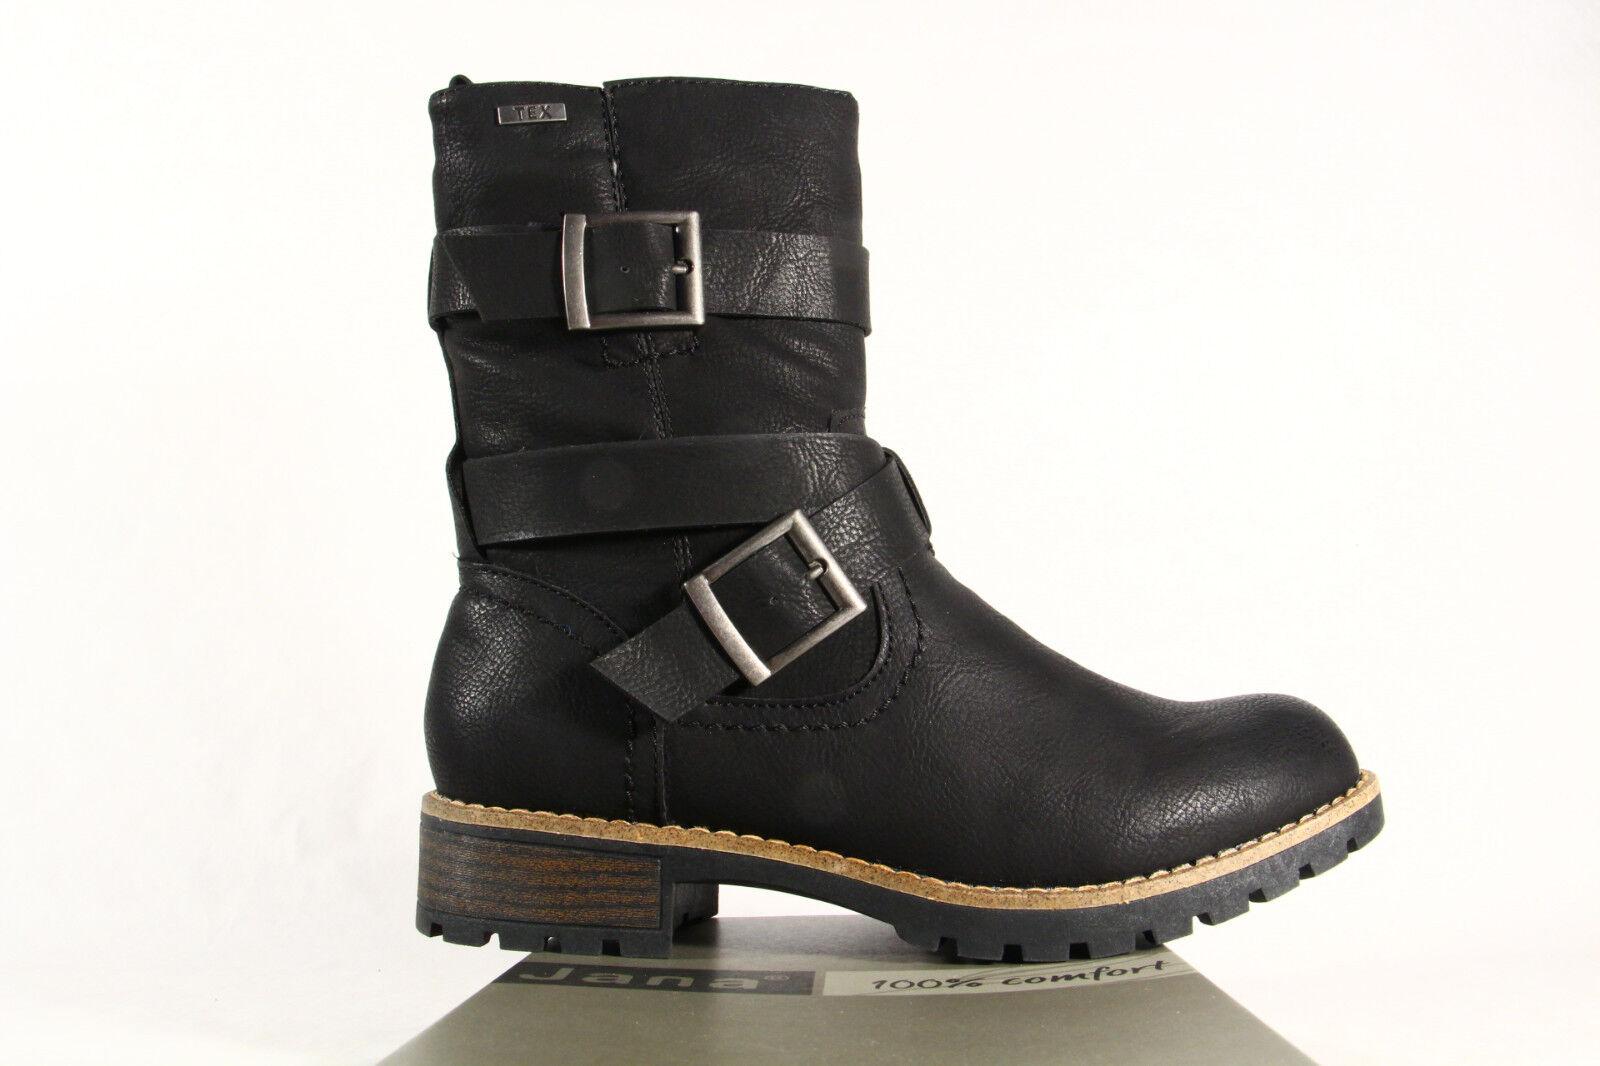 Jana Stiefelette, Stiefel,  26426 Boots  Tex schwarz 26426  NEU 9d08c9